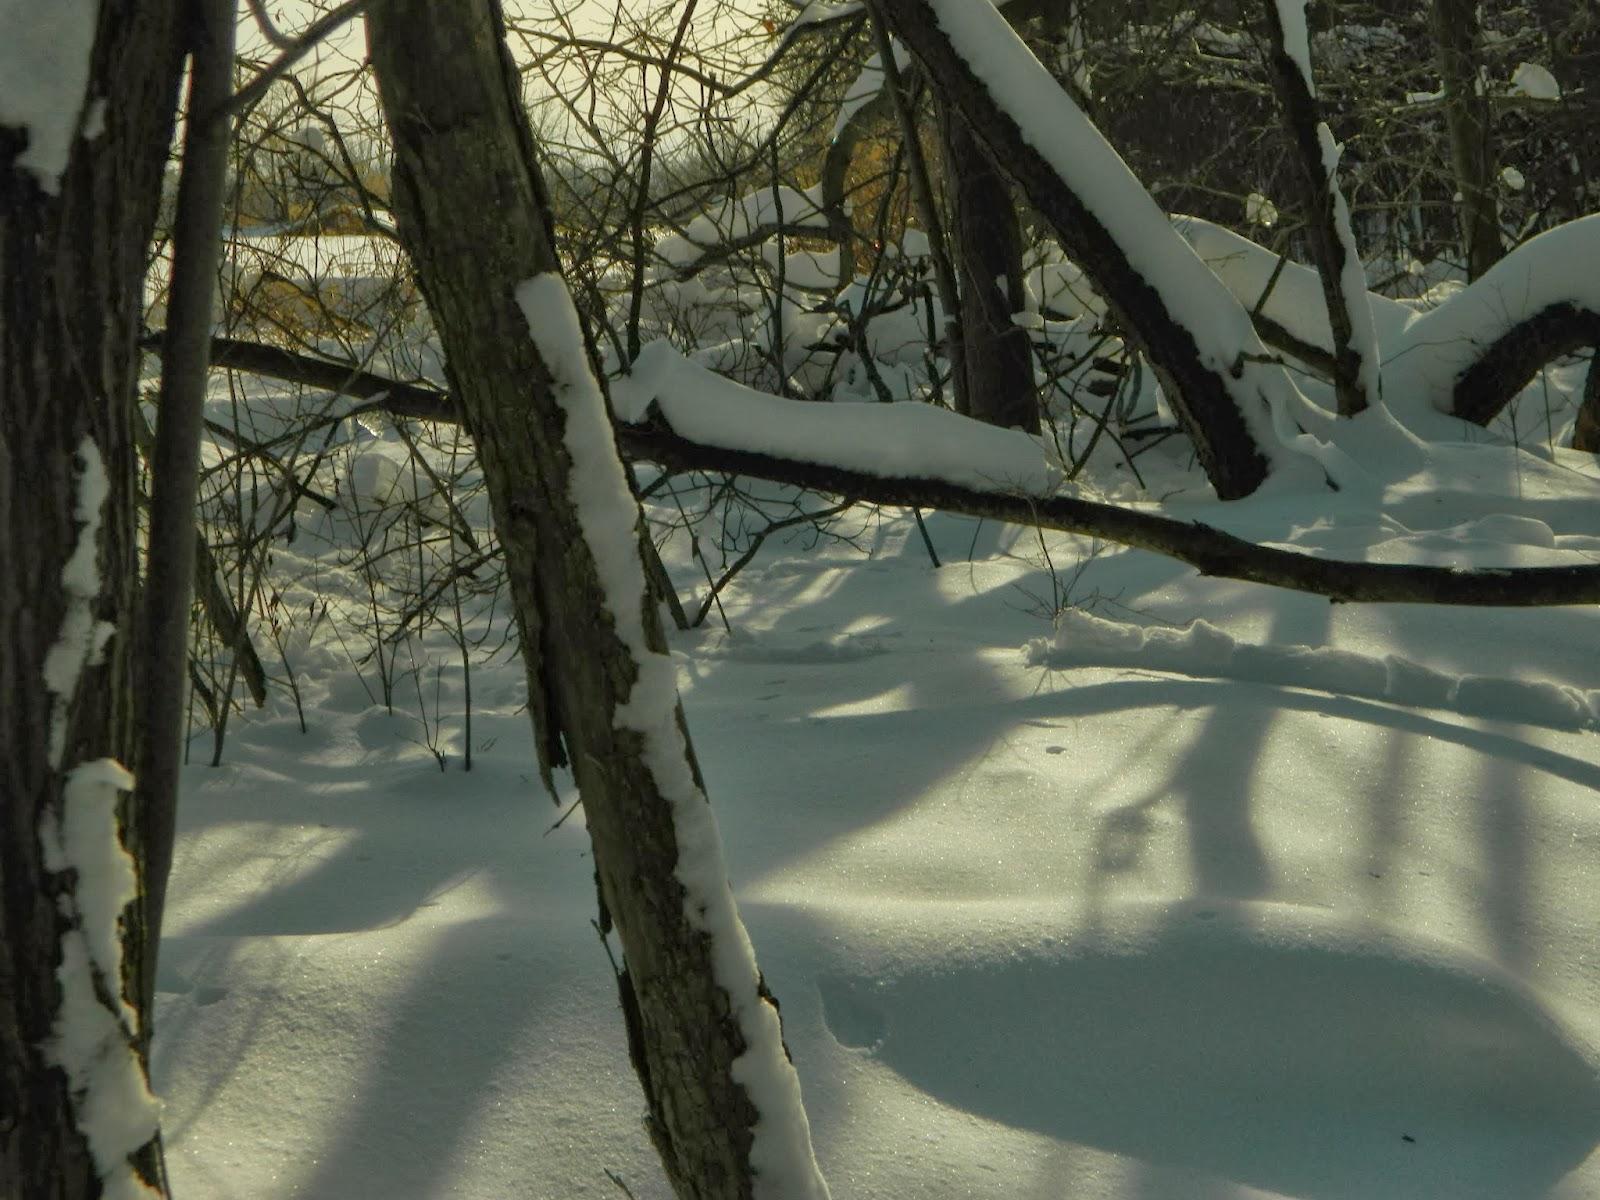 afc12-winter